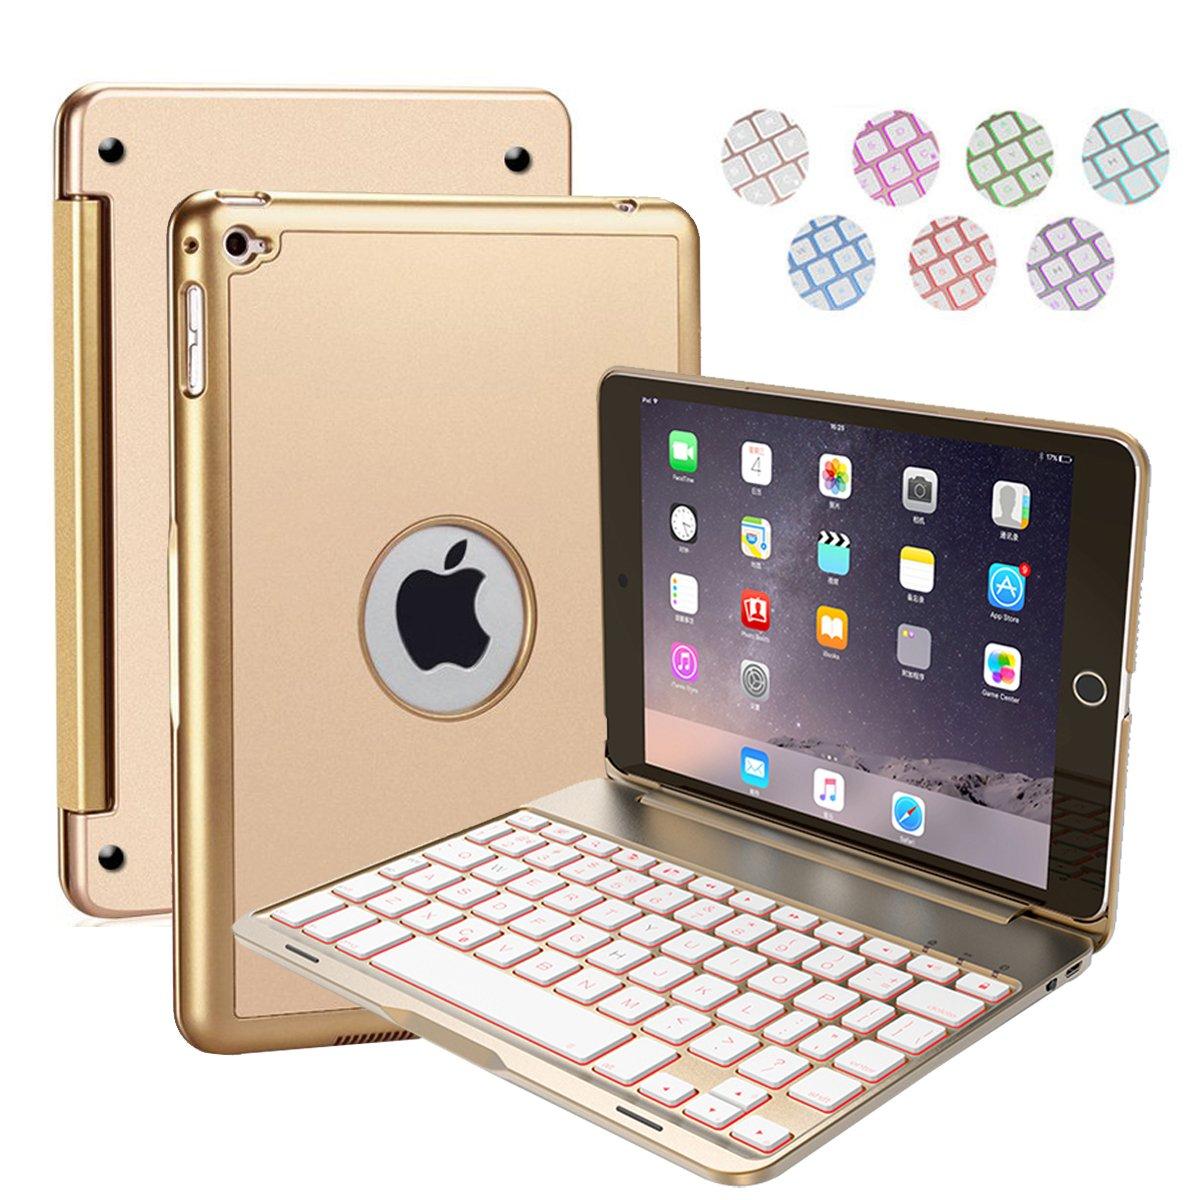 iPad Mini4 Keyboard Case Nasion.V Bluetooth Wireless Keyboard Case Cover with 7 Colors Folio Backlight Ultra-Thin Portable Keyboard Case for iPad Mini4 - Rosegold